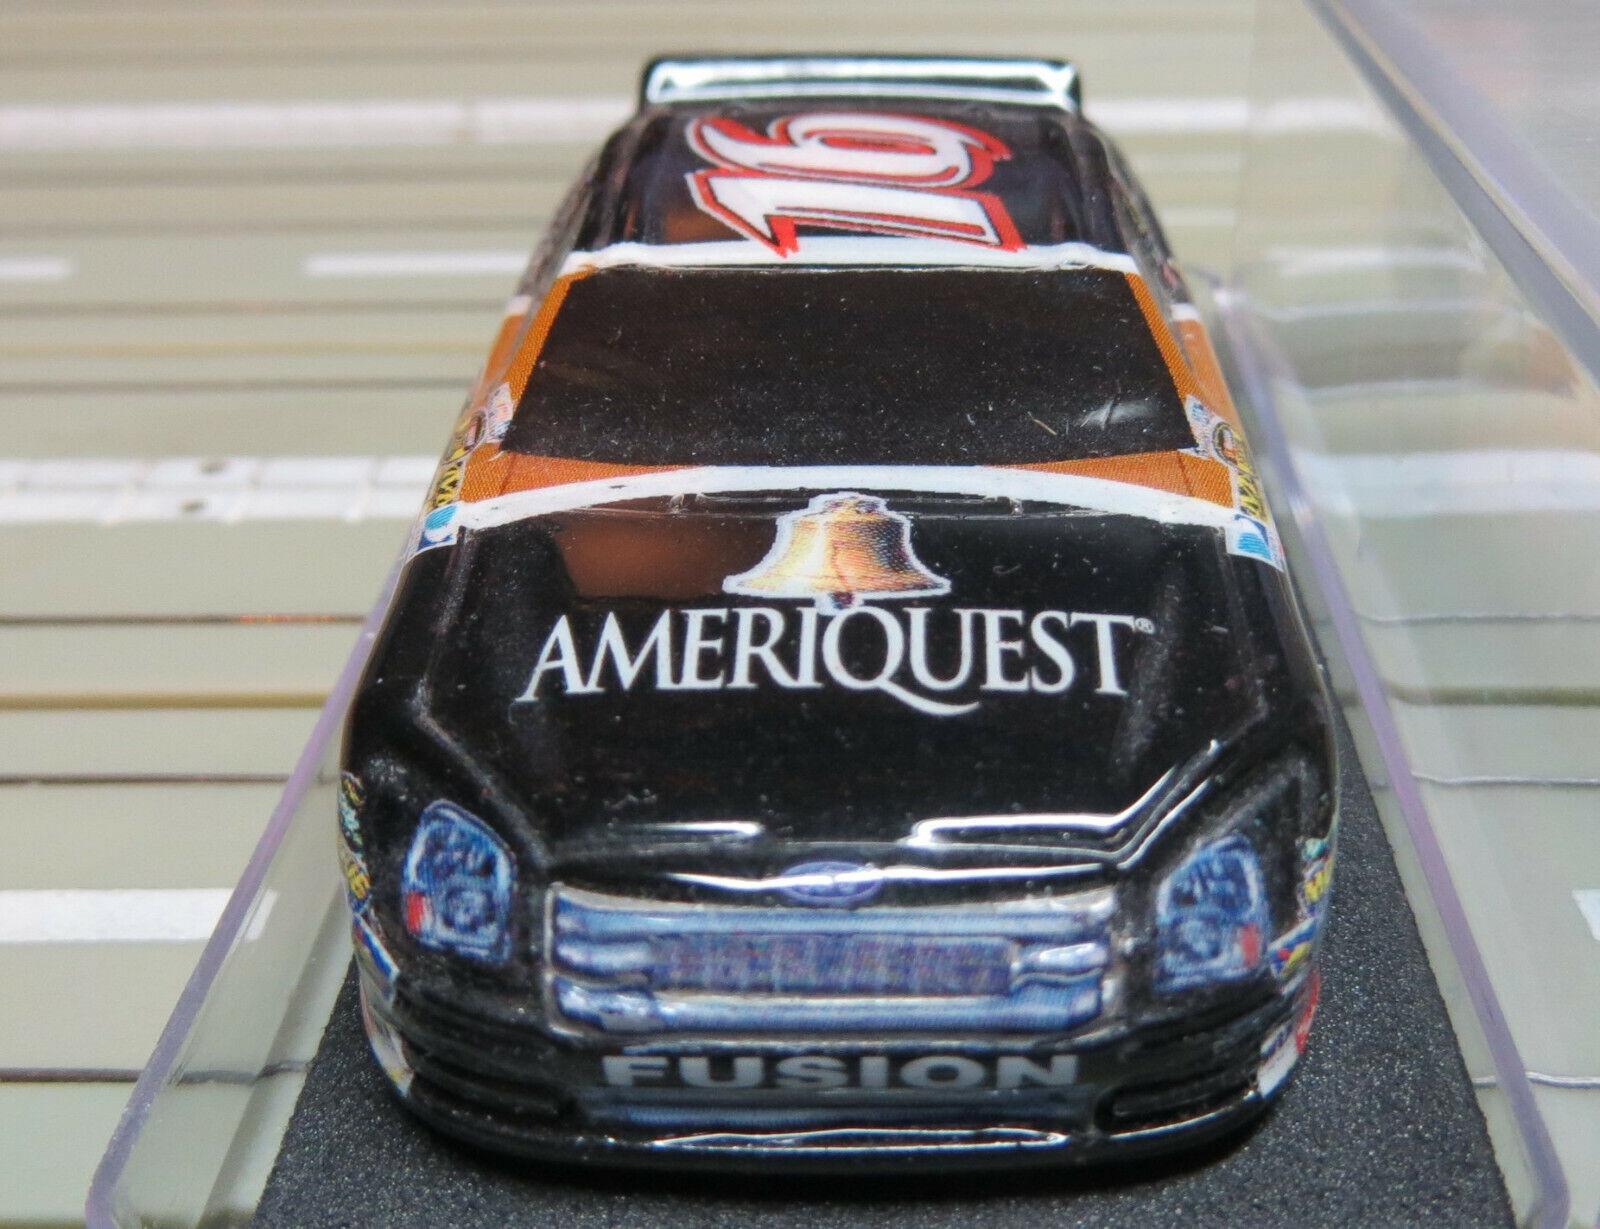 H0 car slot racing model train nascar with life like engine